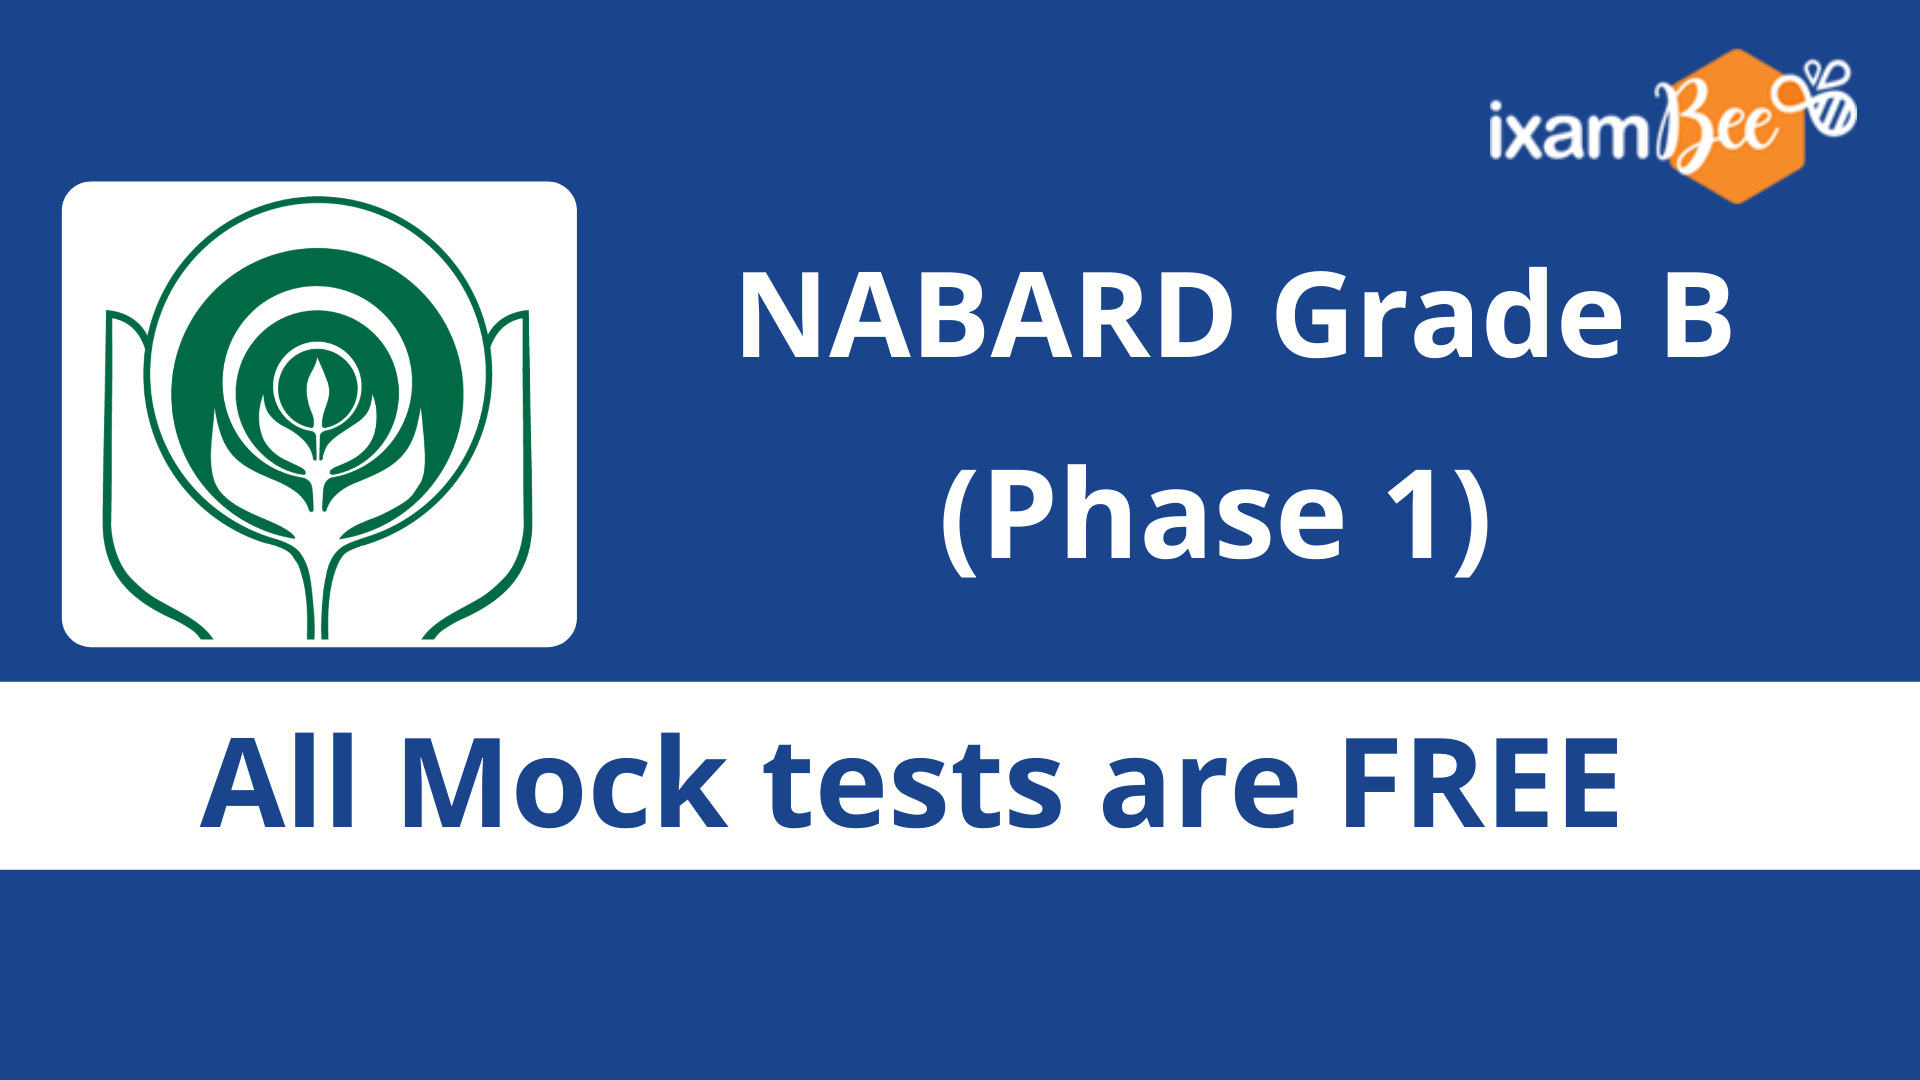 NABARD grade B prelims free mock test